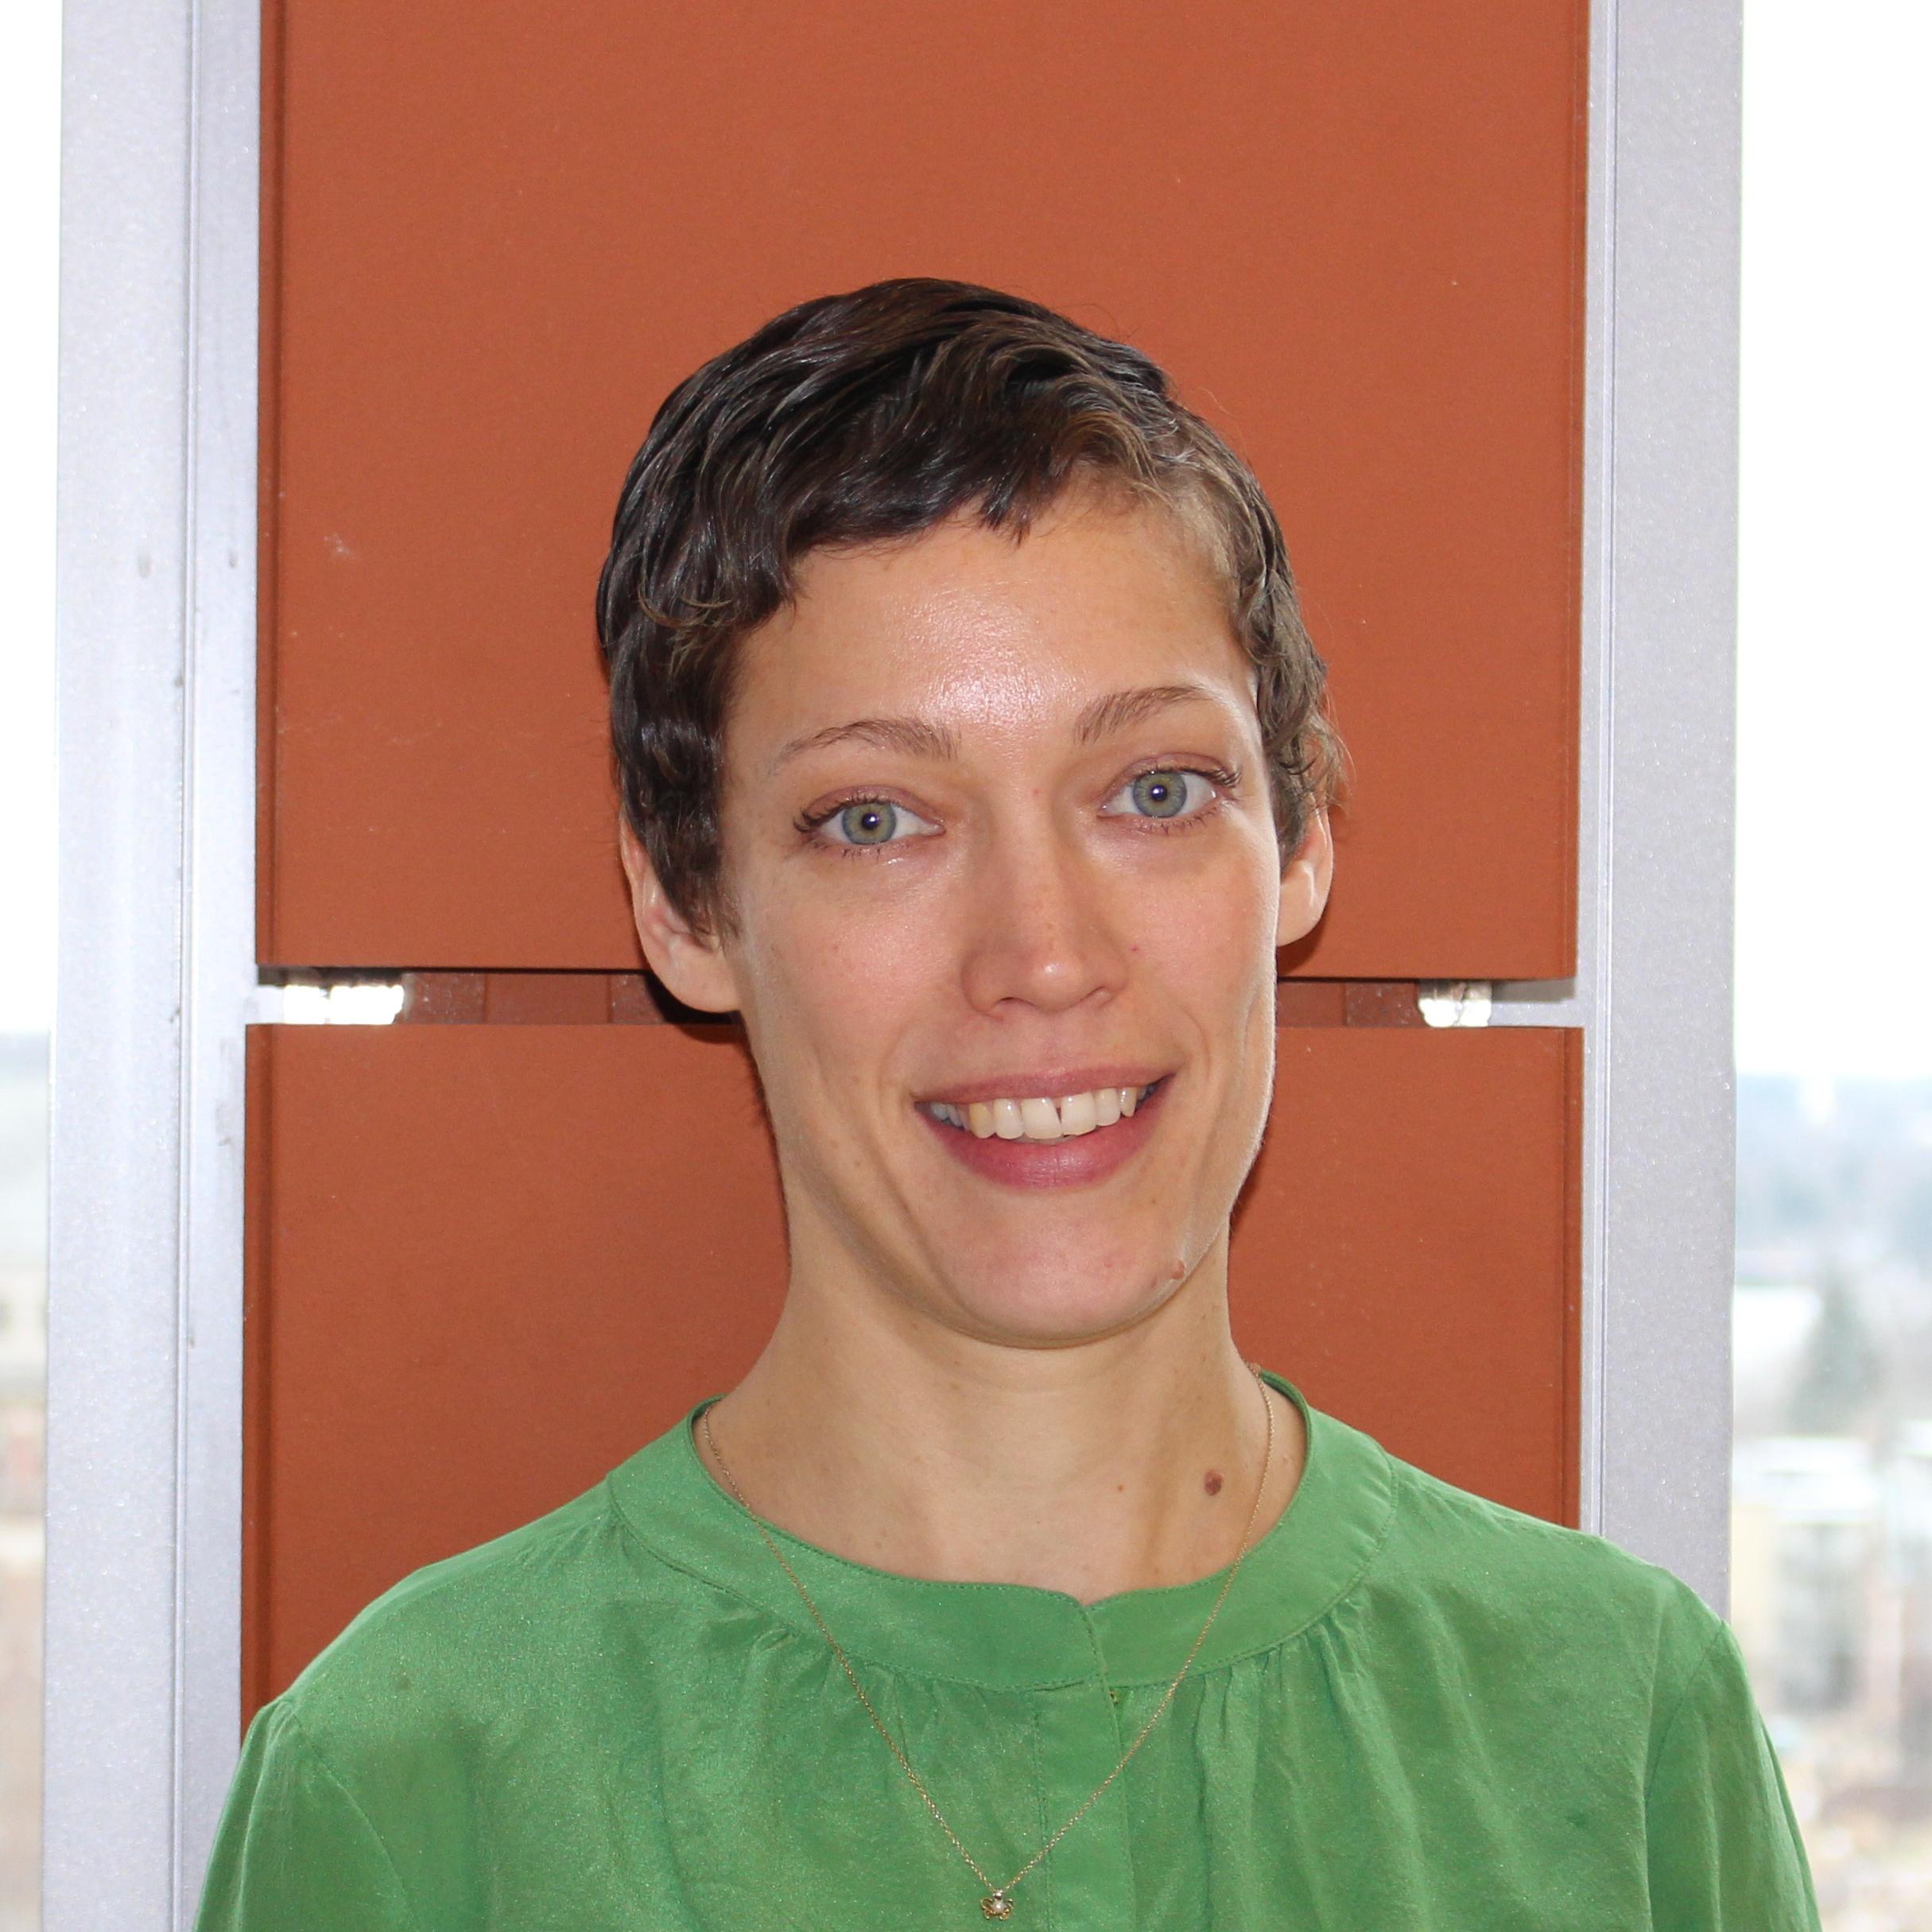 Esther Kyte